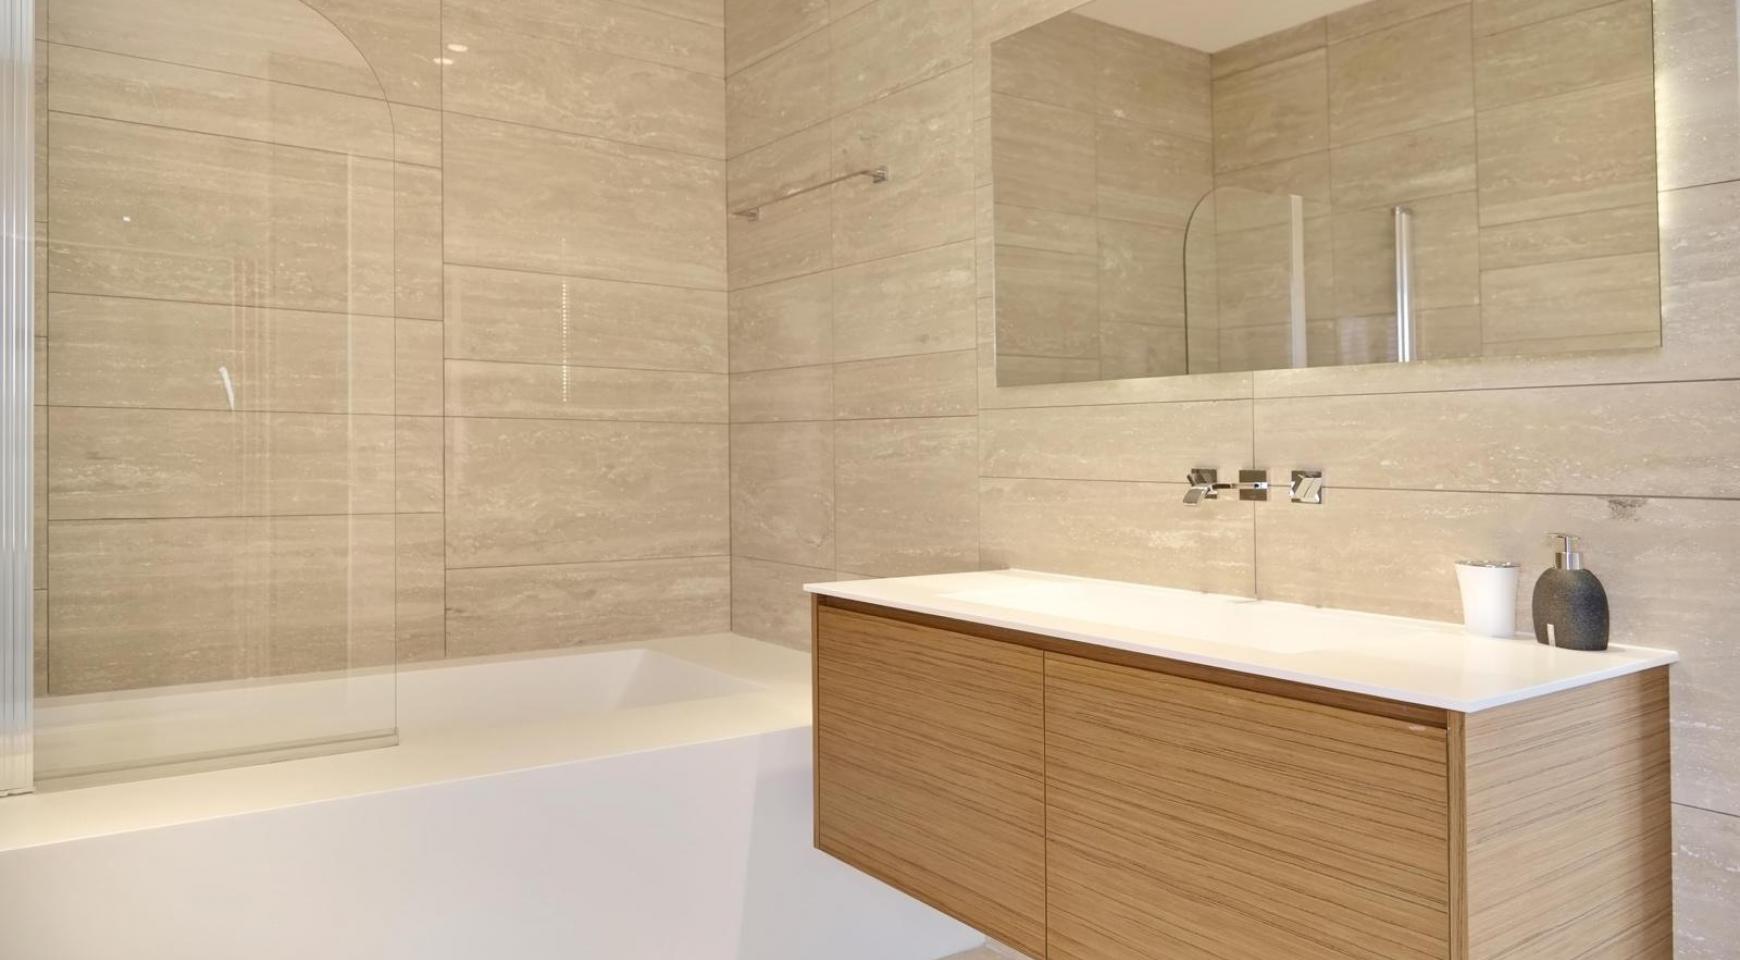 New Luxurious 4 Bedroom Villa in the Tourist Area - 45